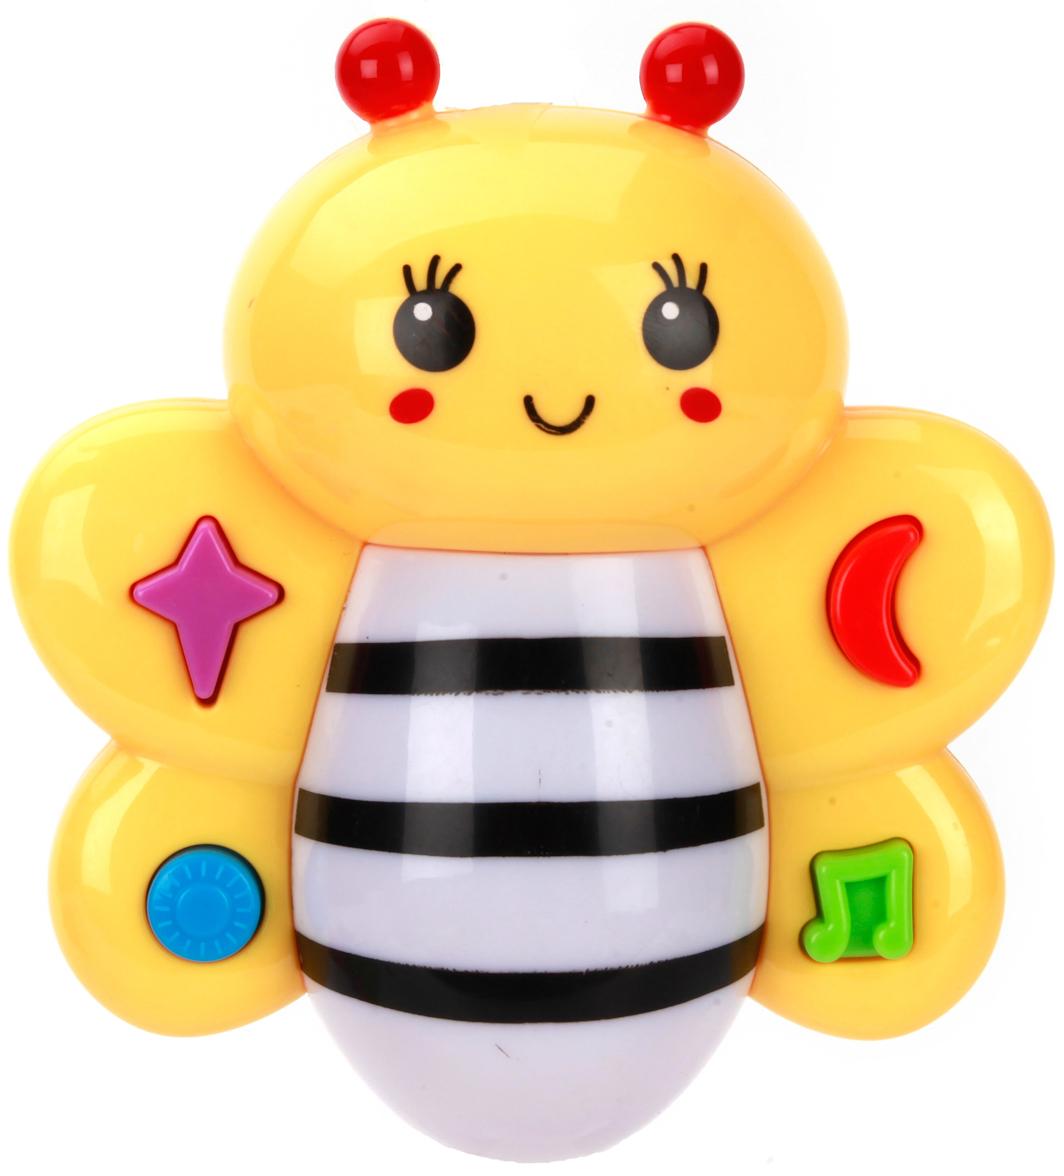 Погремушки Умка Погремушка Умка «Музыкальная пчелка» карандаш с вашим именем пчелка